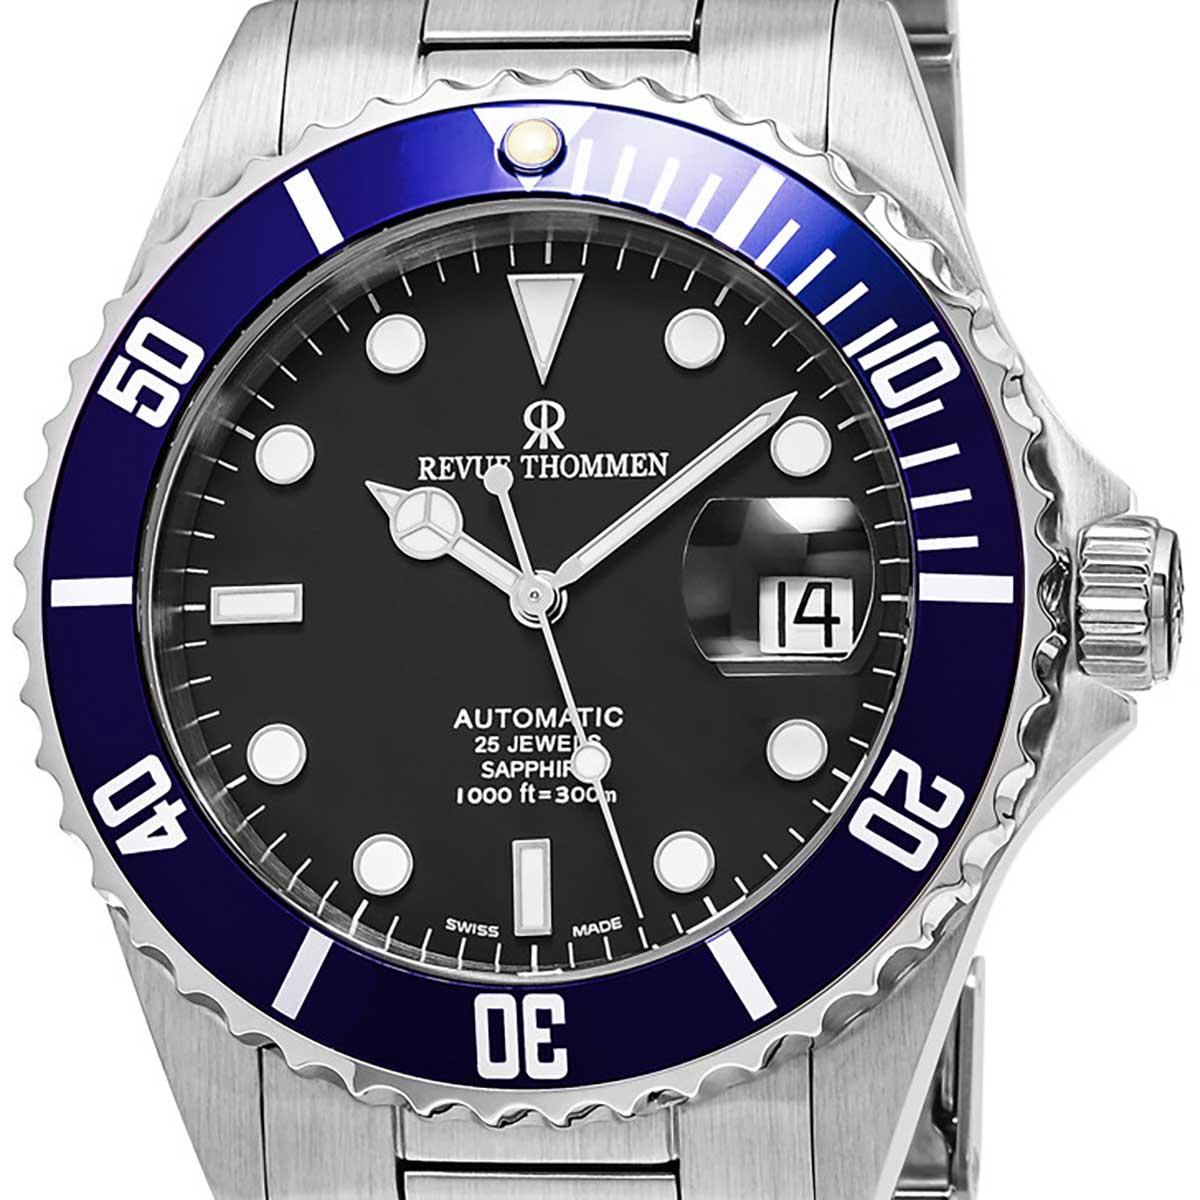 REVUE THOMMEN レビュートーメン 自動巻き(手巻き機能あり) 腕時計 [17571.2135] 並行輸入品 ブラック(黒)